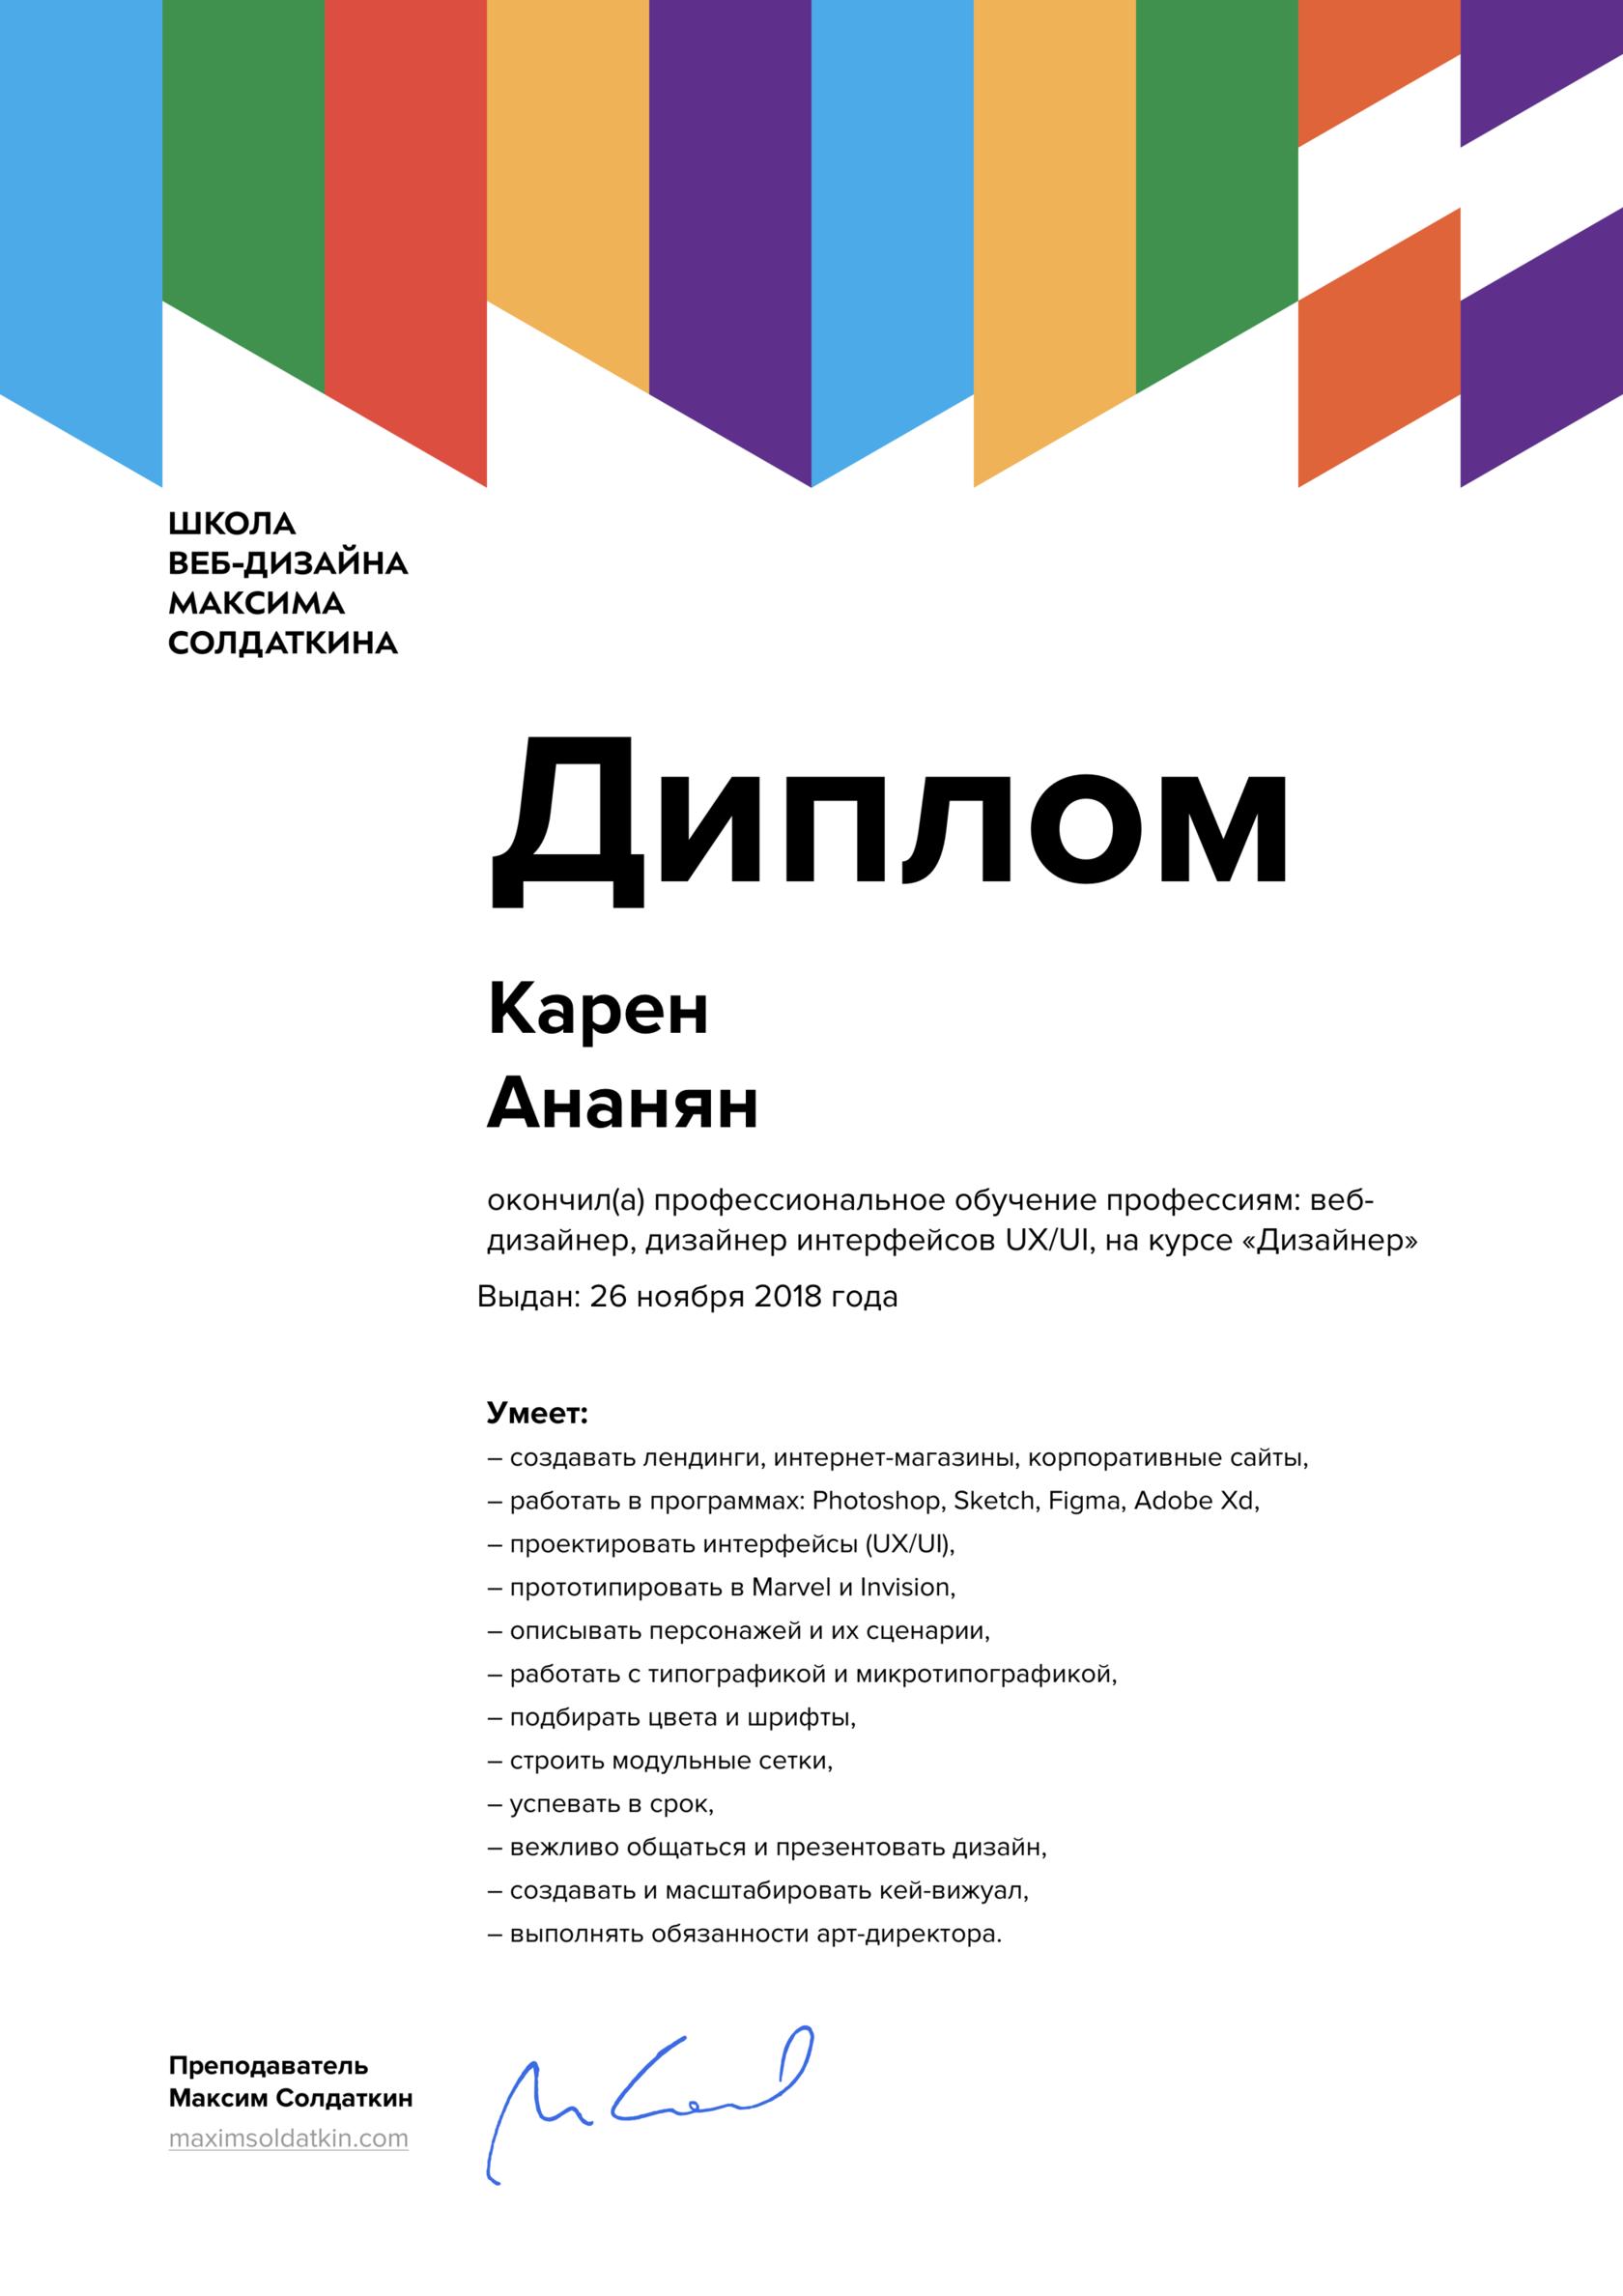 Диплом. Веб-дизайн. Школа веб-дизайна Максима Солдаткина. Ананян Карен.